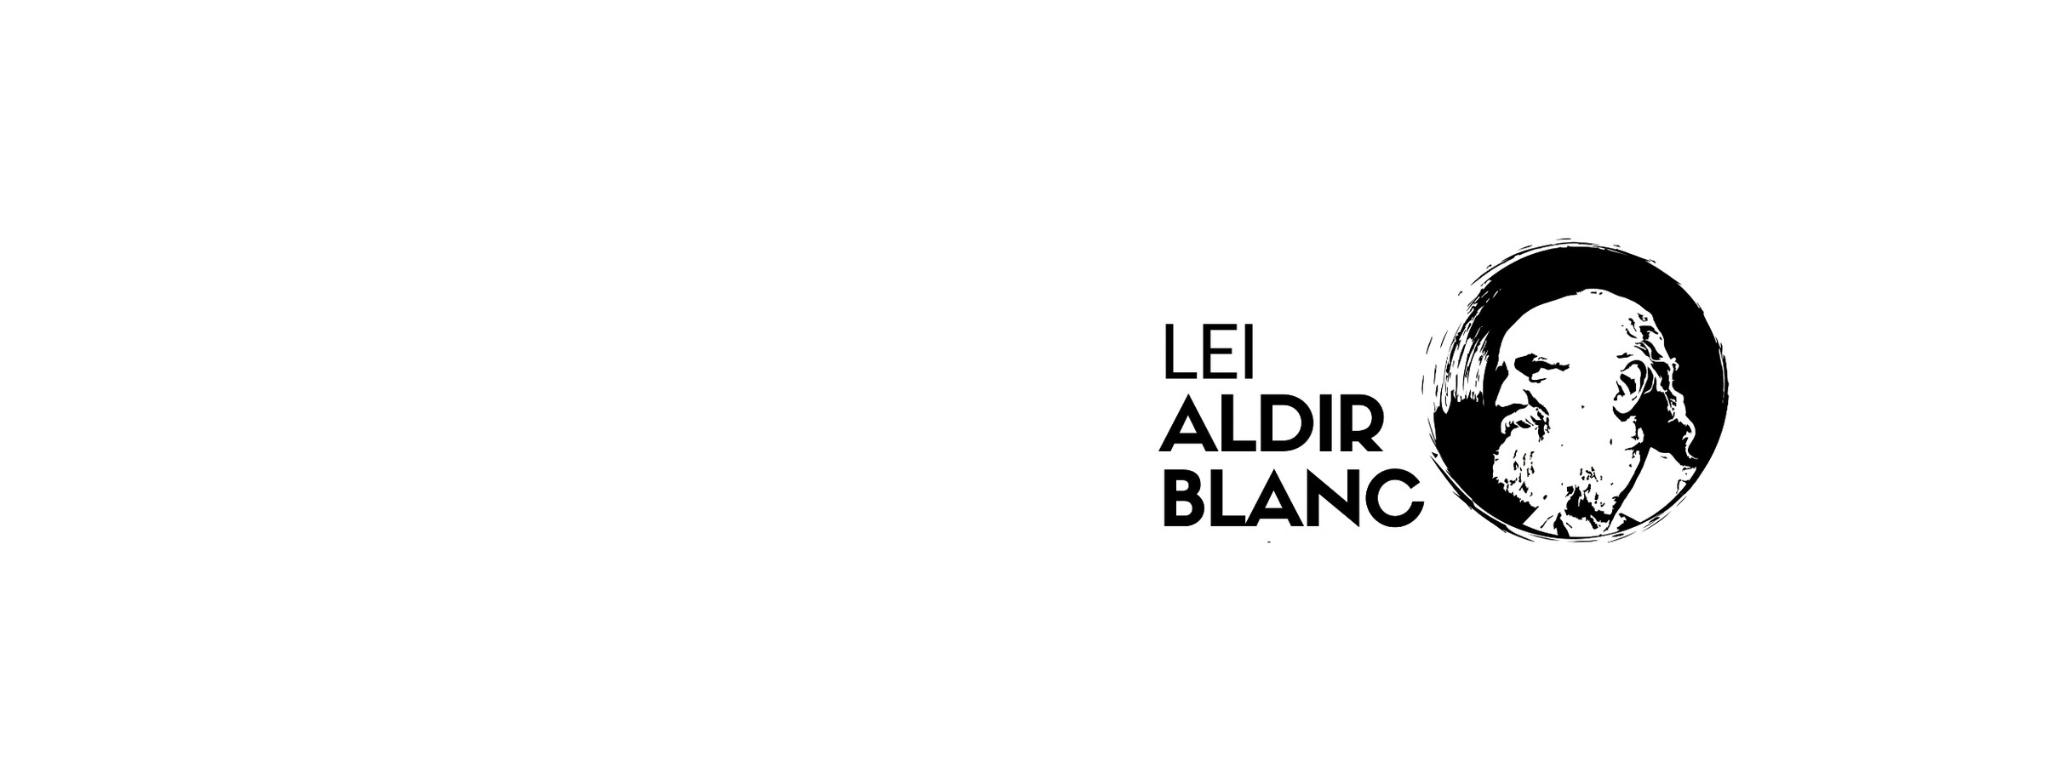 Lei Aldir Blanc – Resultado final das propostas selecionadas após recursos dos Editais de Culturas Indígenas e Cultura Afro